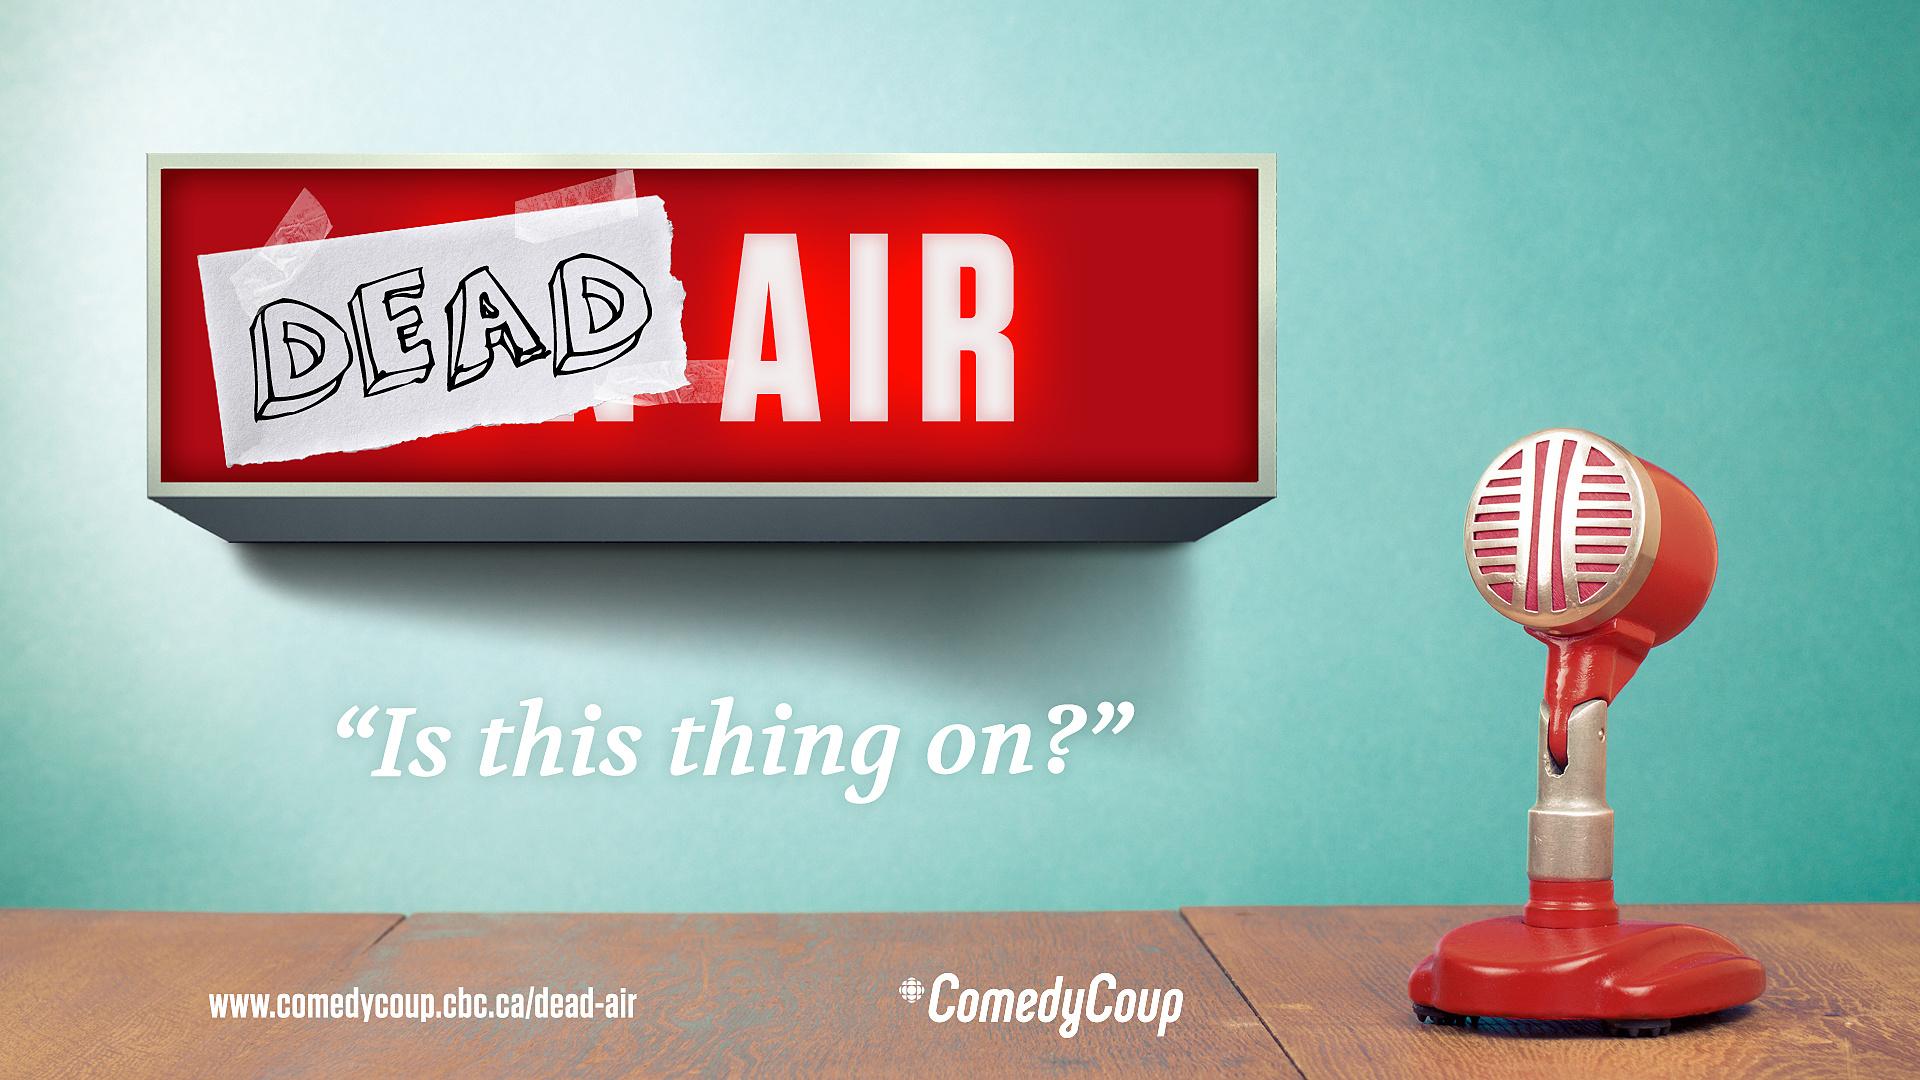 Week 4 Key It: Poster B Dead Air